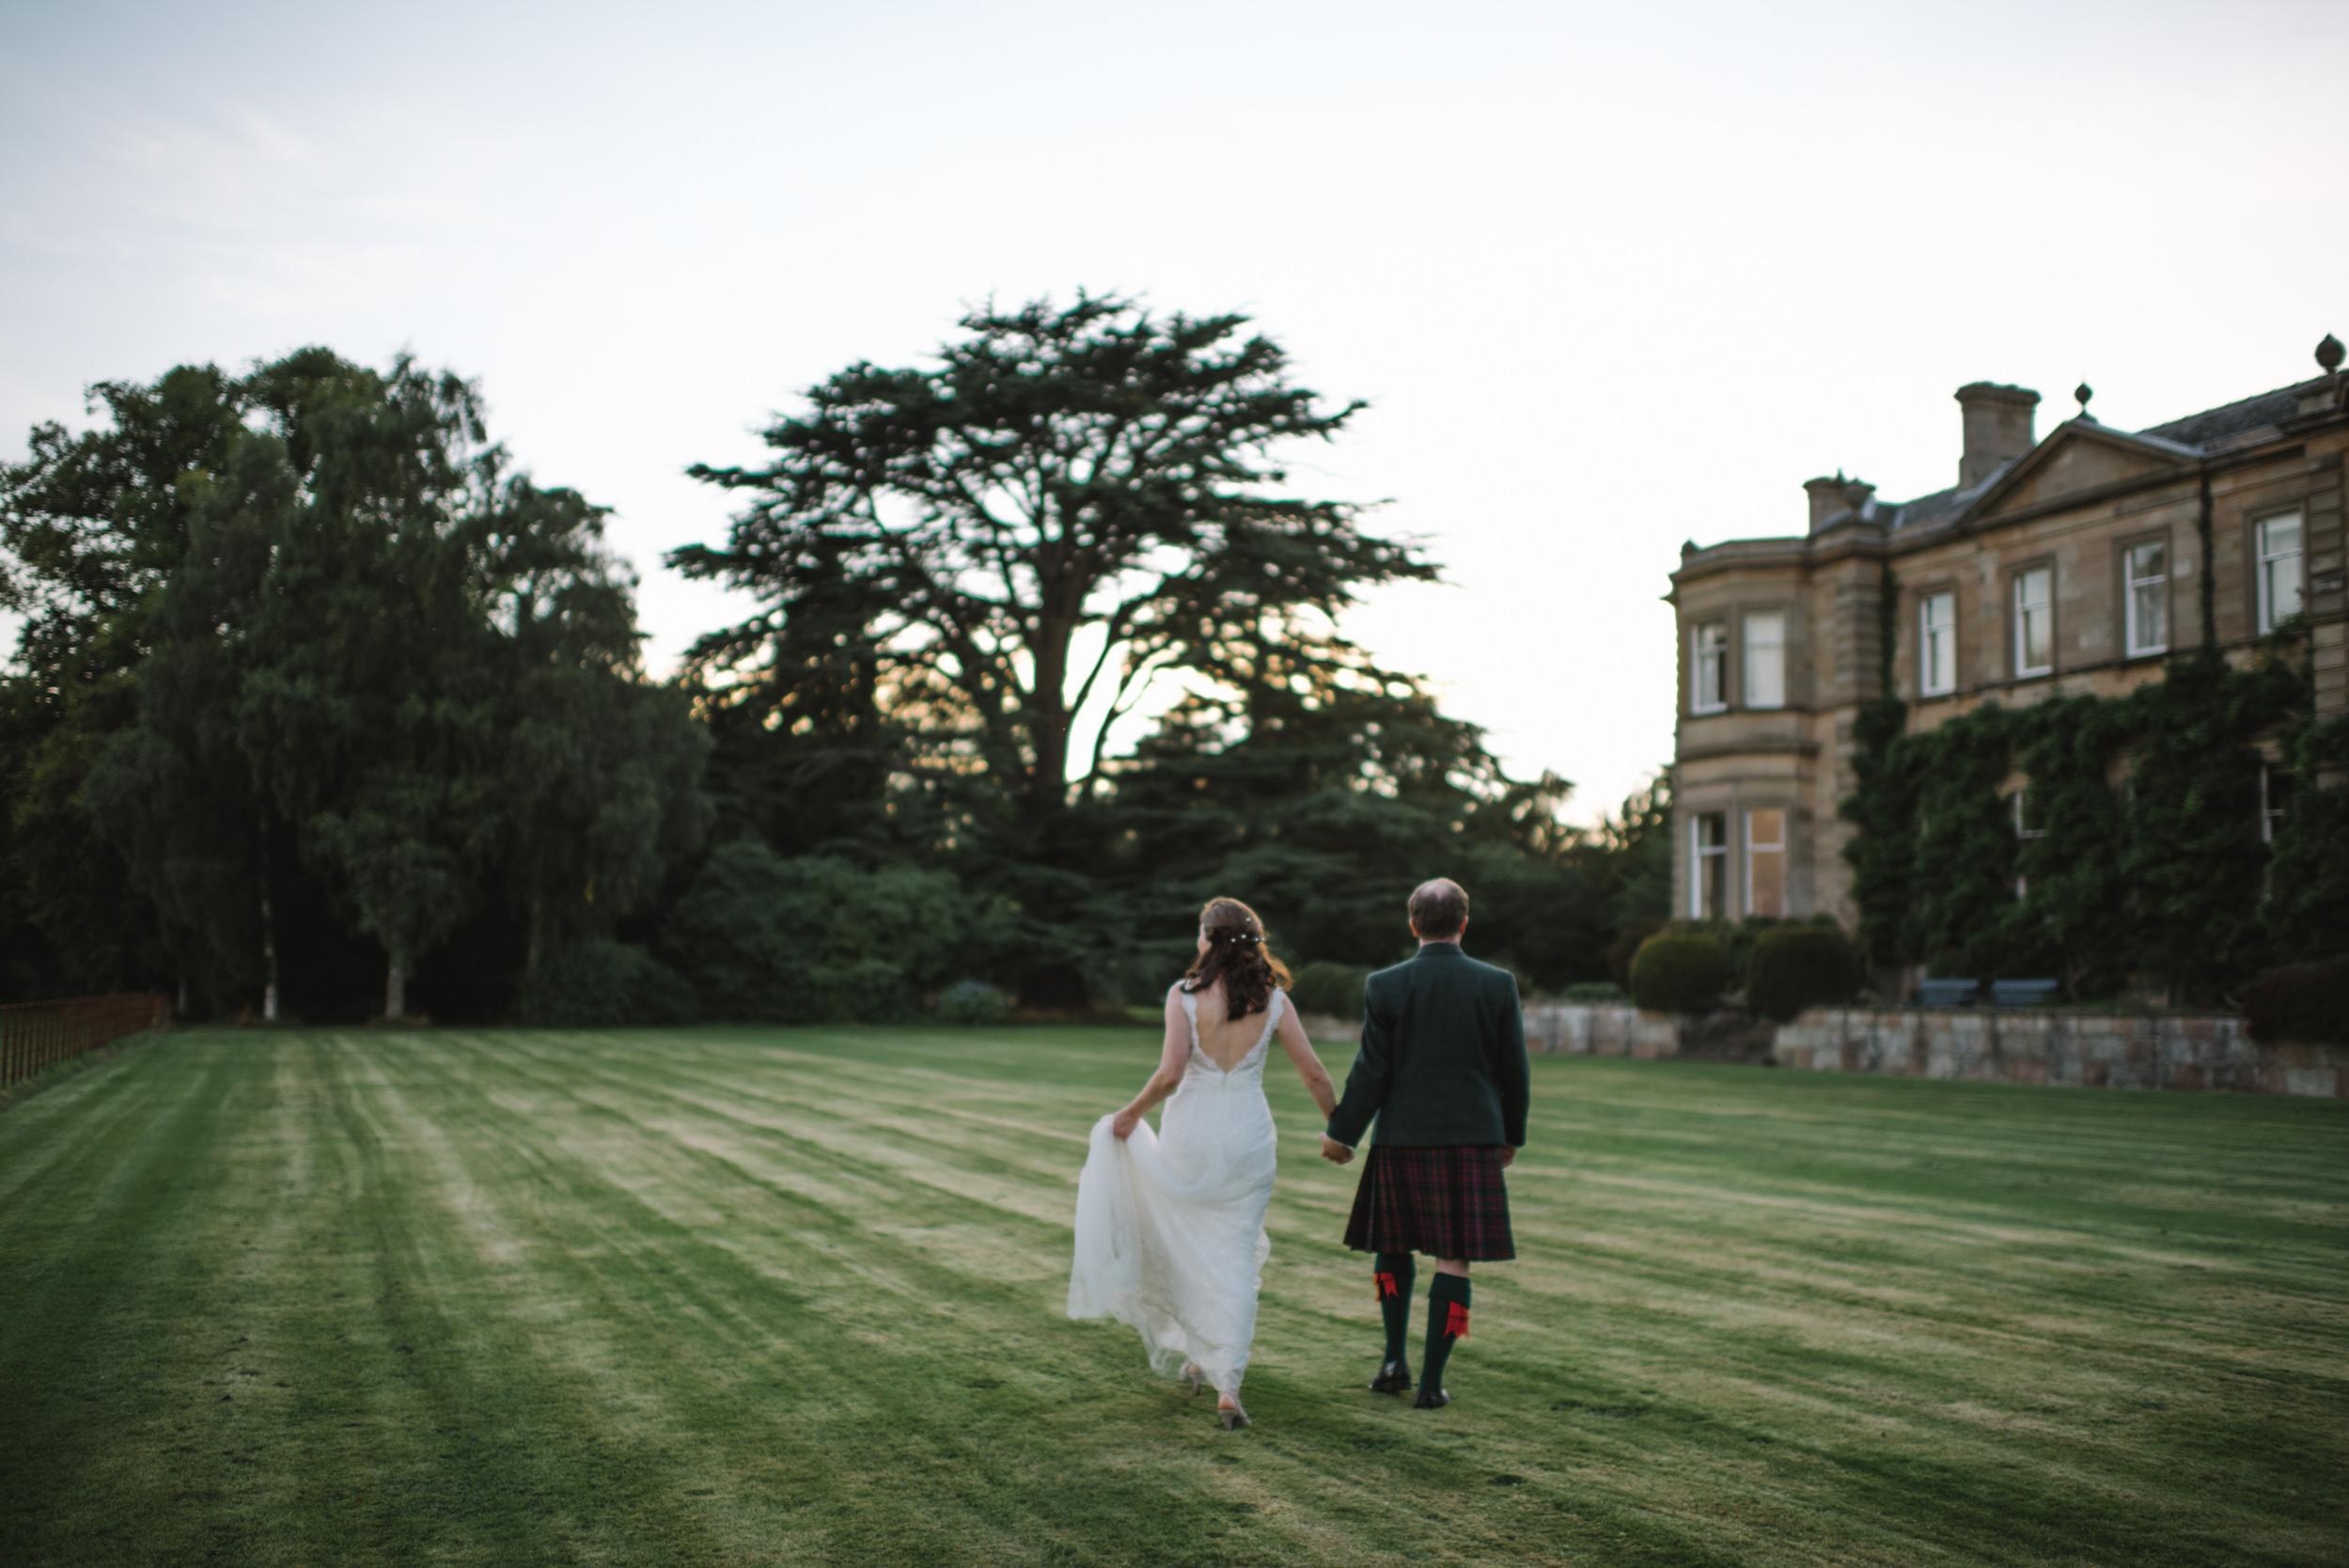 0151-alternative-wedding-portrait-family-kids-photographer-glasgow-scotland.JPG